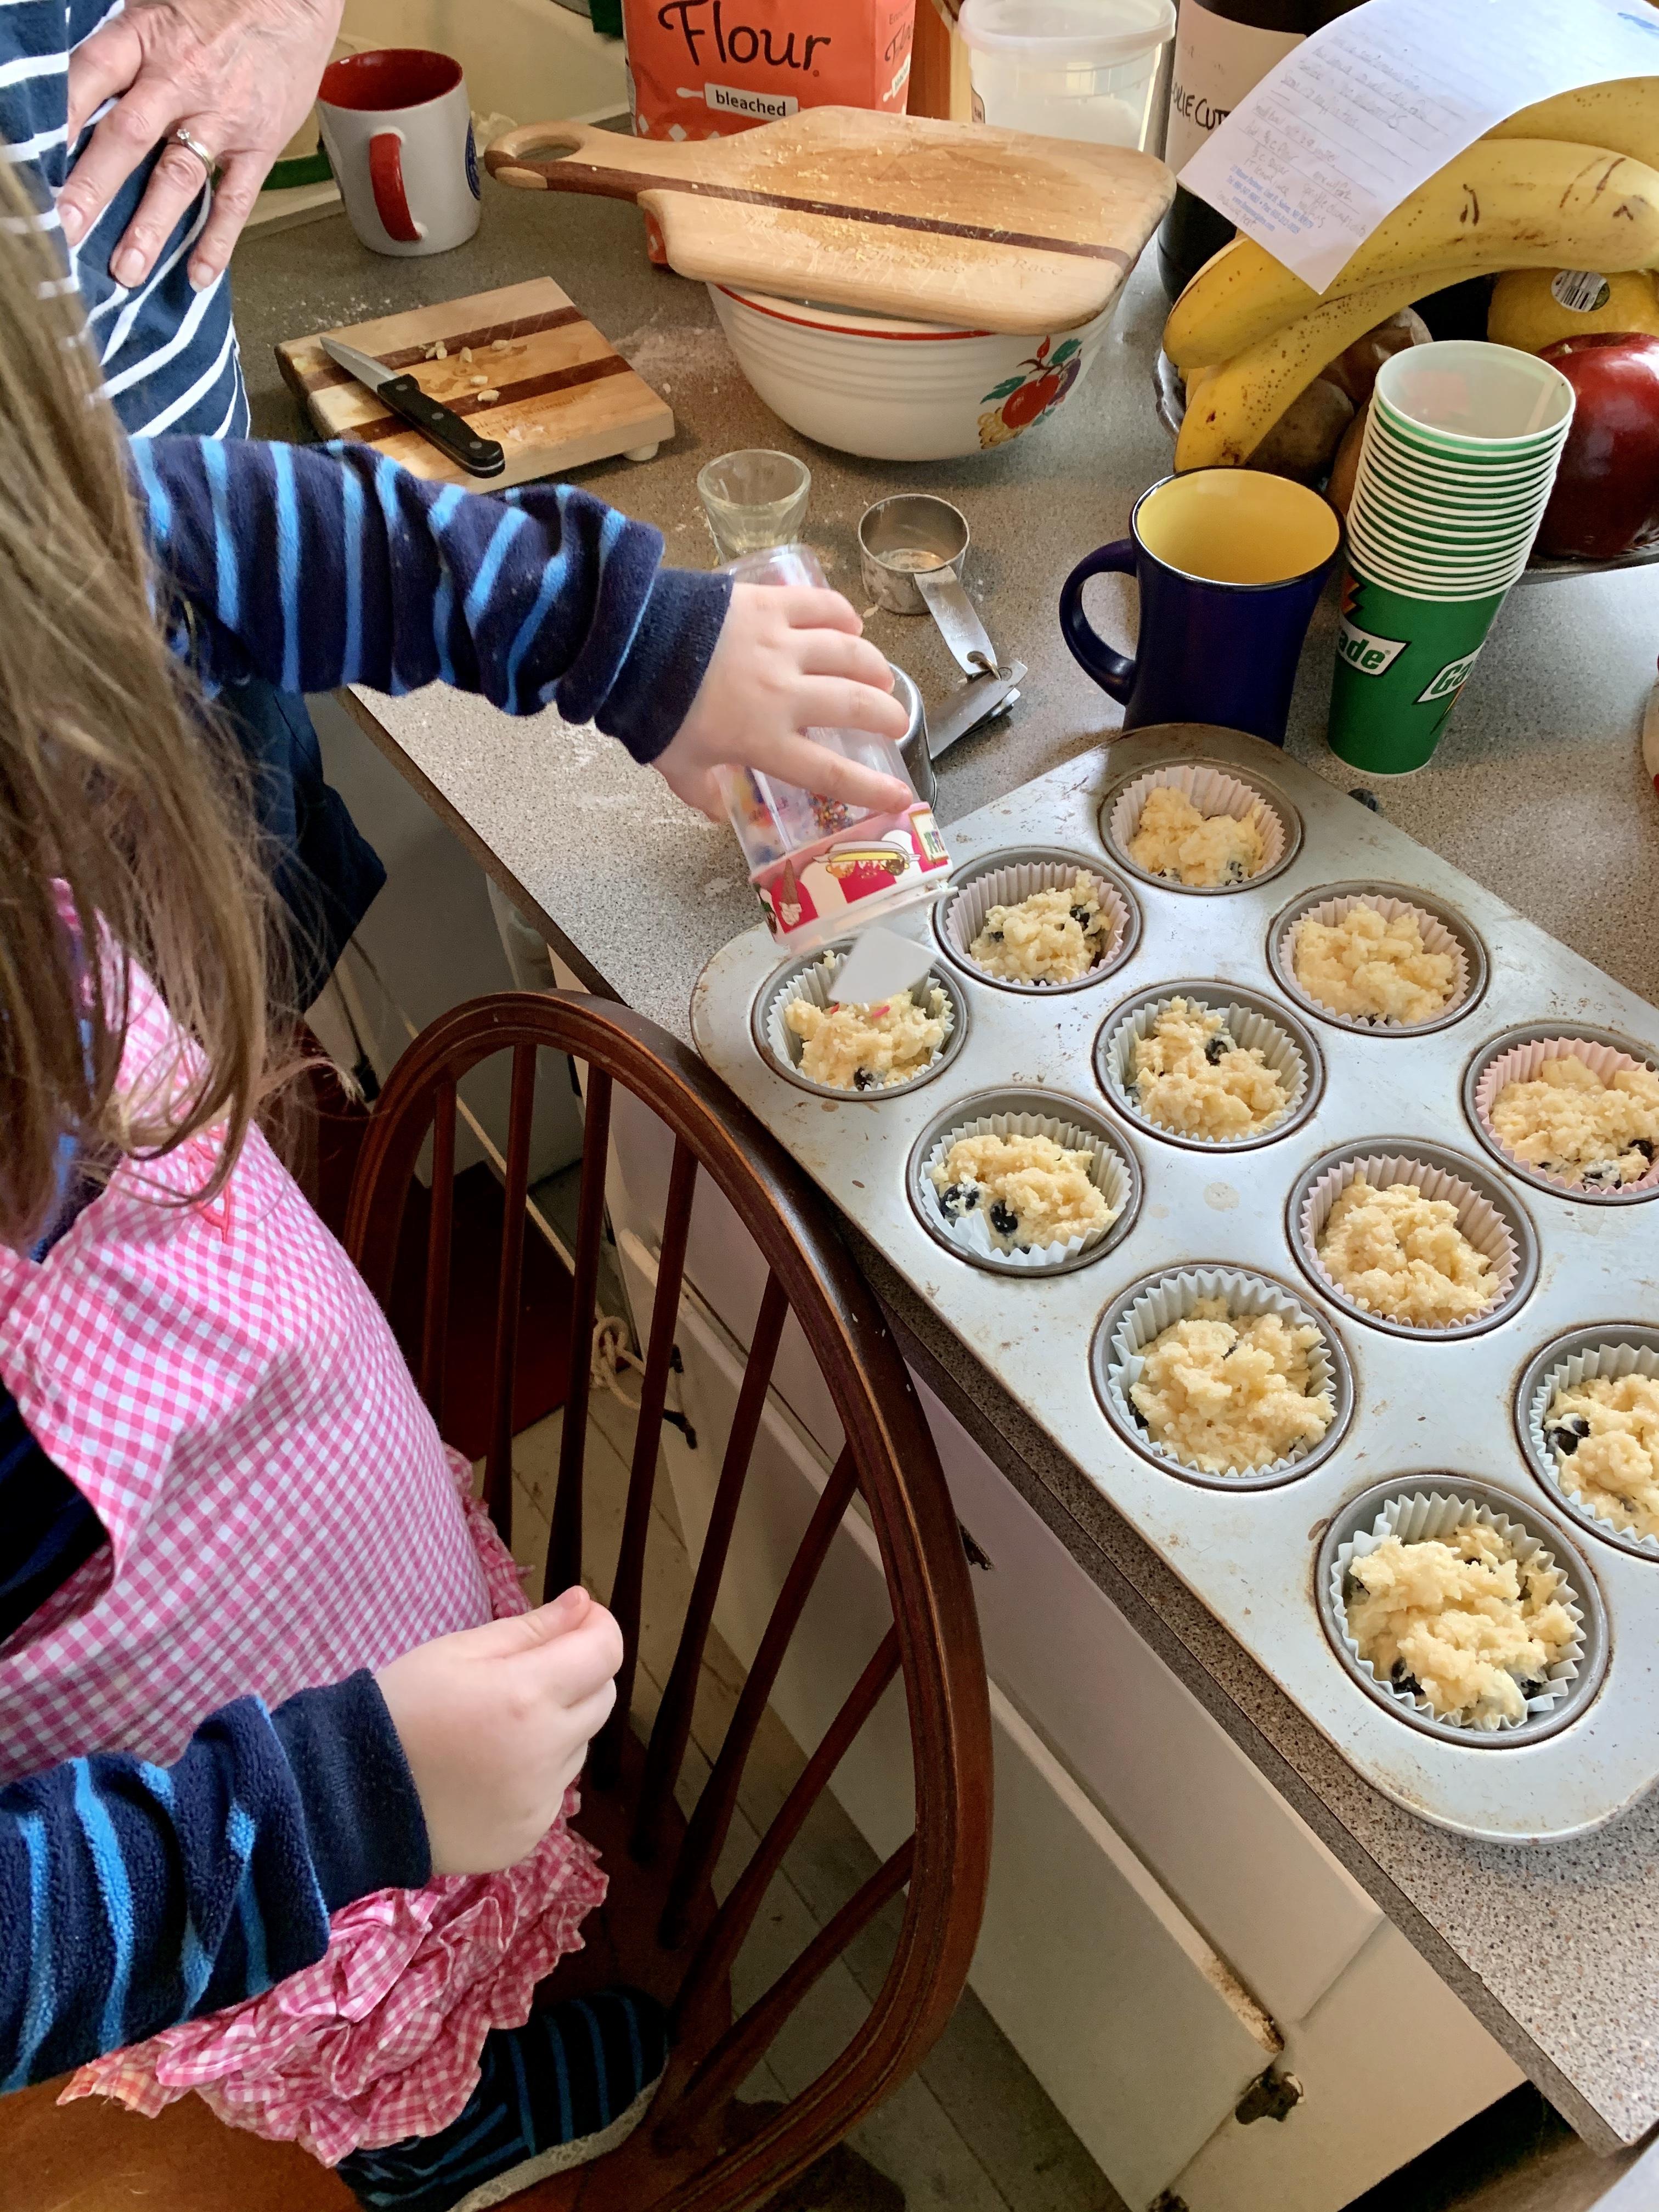 Sprinkling onto muffins